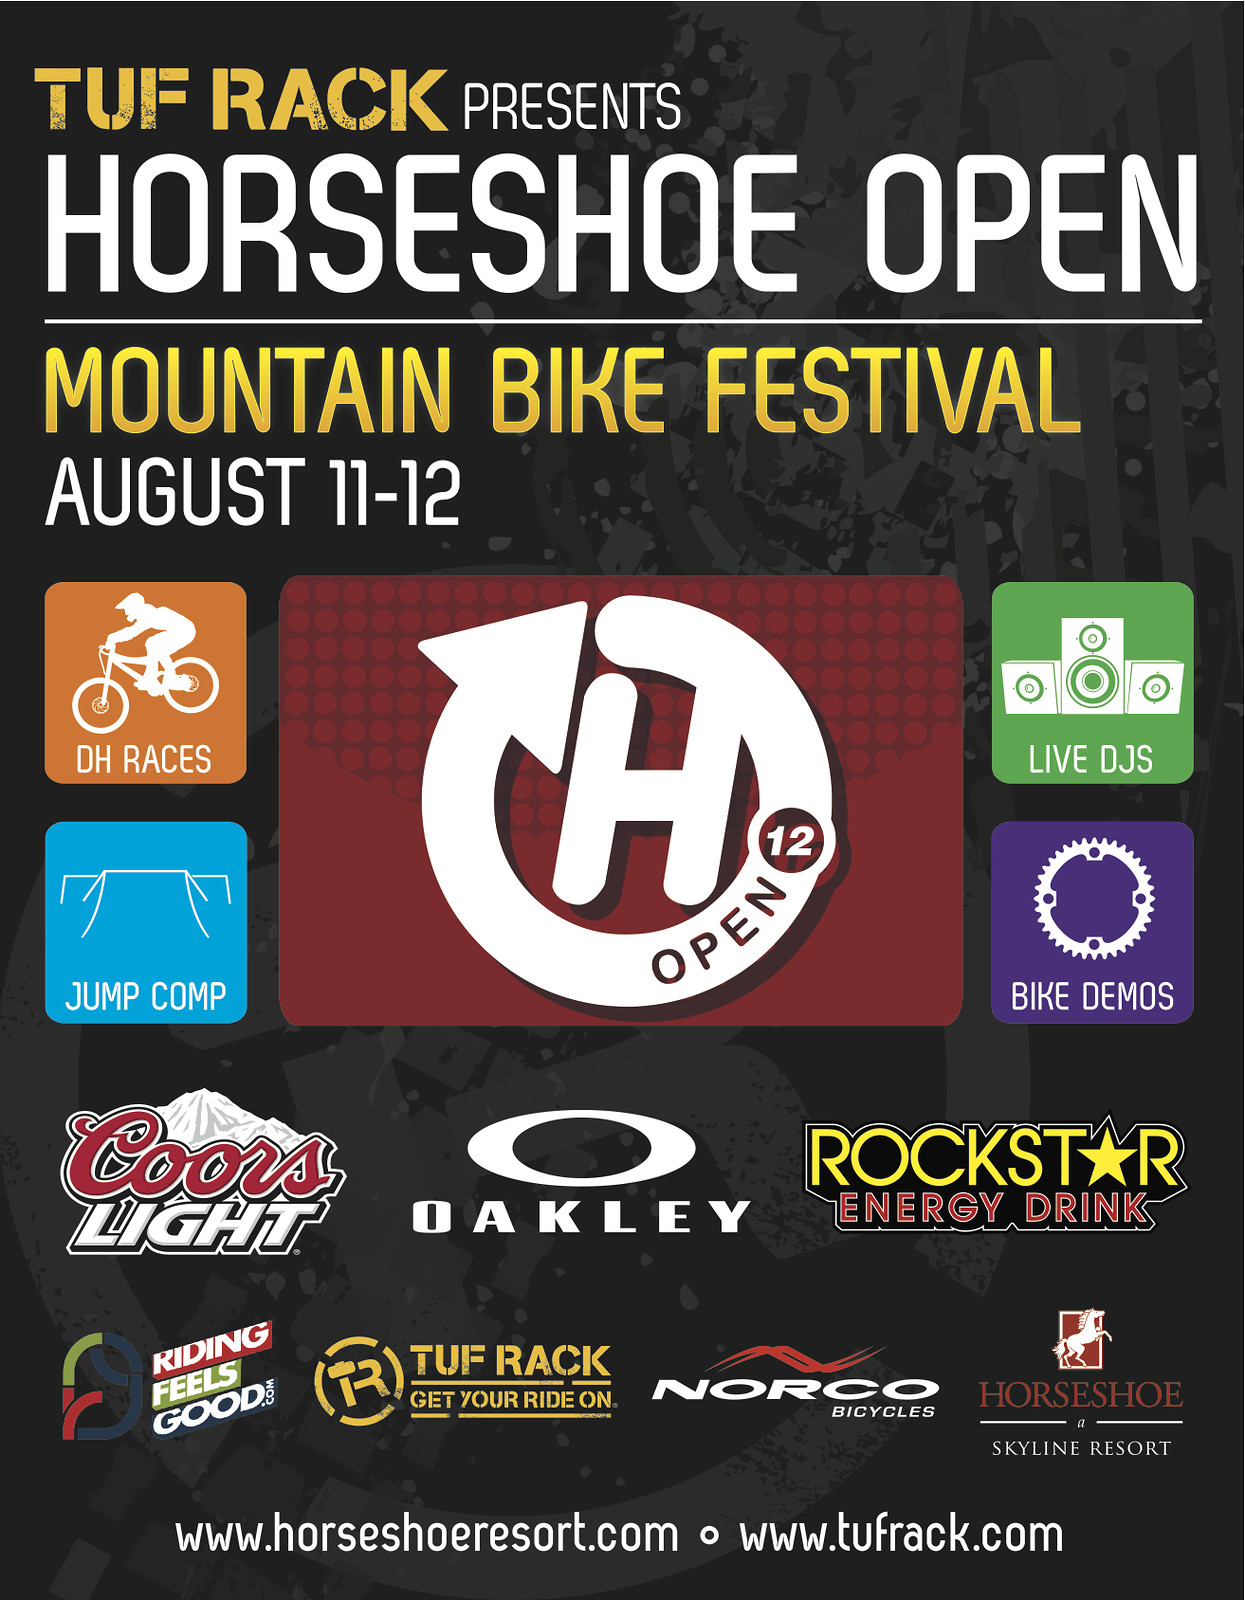 horseshoeopen dh poster v3 - tufrack - Mountain Biking Pictures - Vital MTB